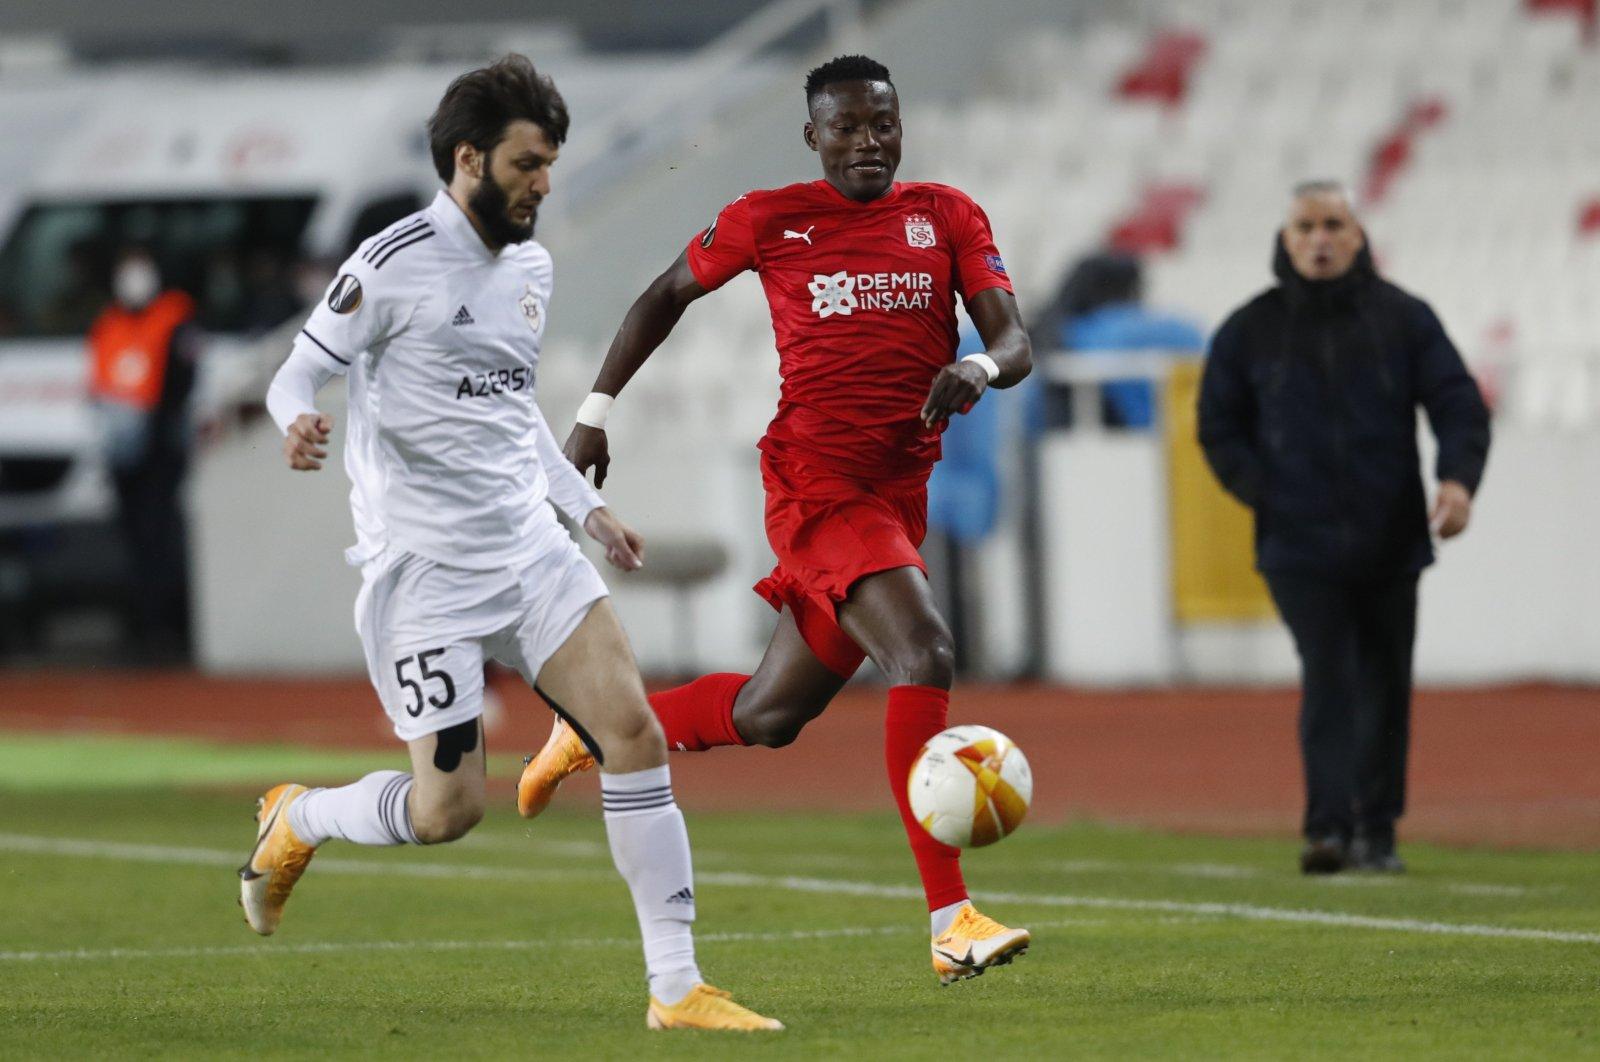 Qarabag's Badavi Huseynov (L) in action with Sivasspor's Casimir Ninga during a Europa League match in Sivas, Turkey, Nov. 5, 2020. (AFP Photo)